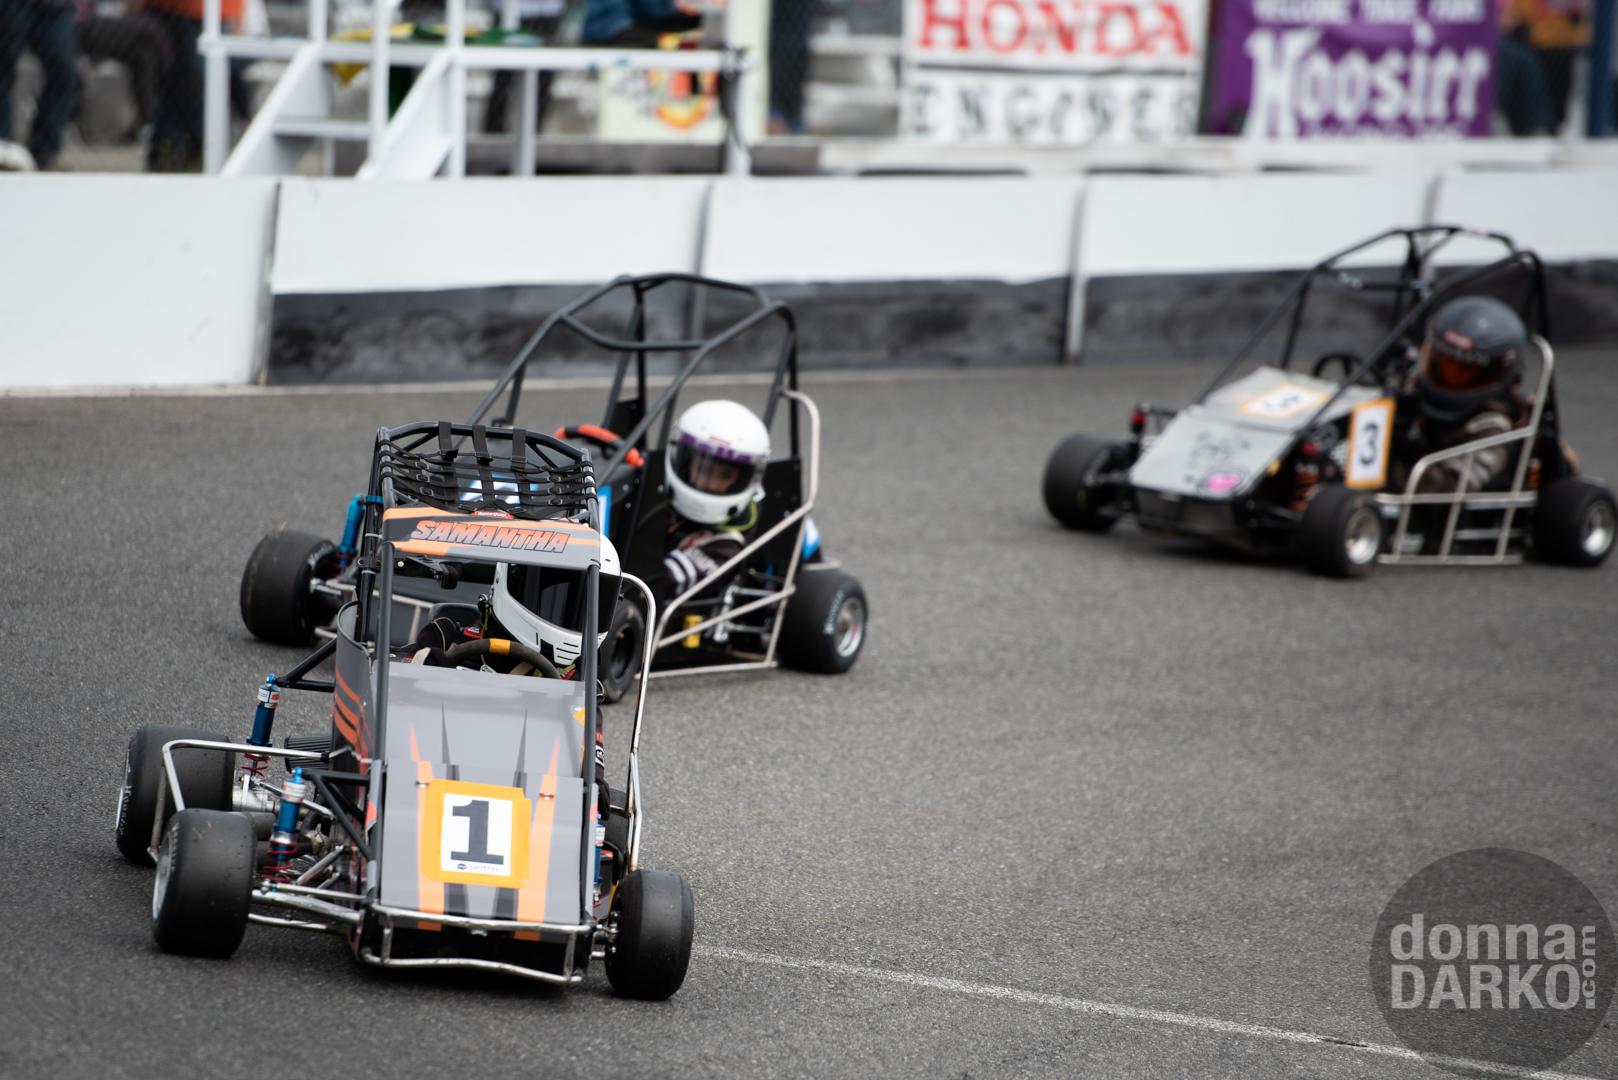 QWMA (Racing) 8-11-2019 DSC_7045.jpg